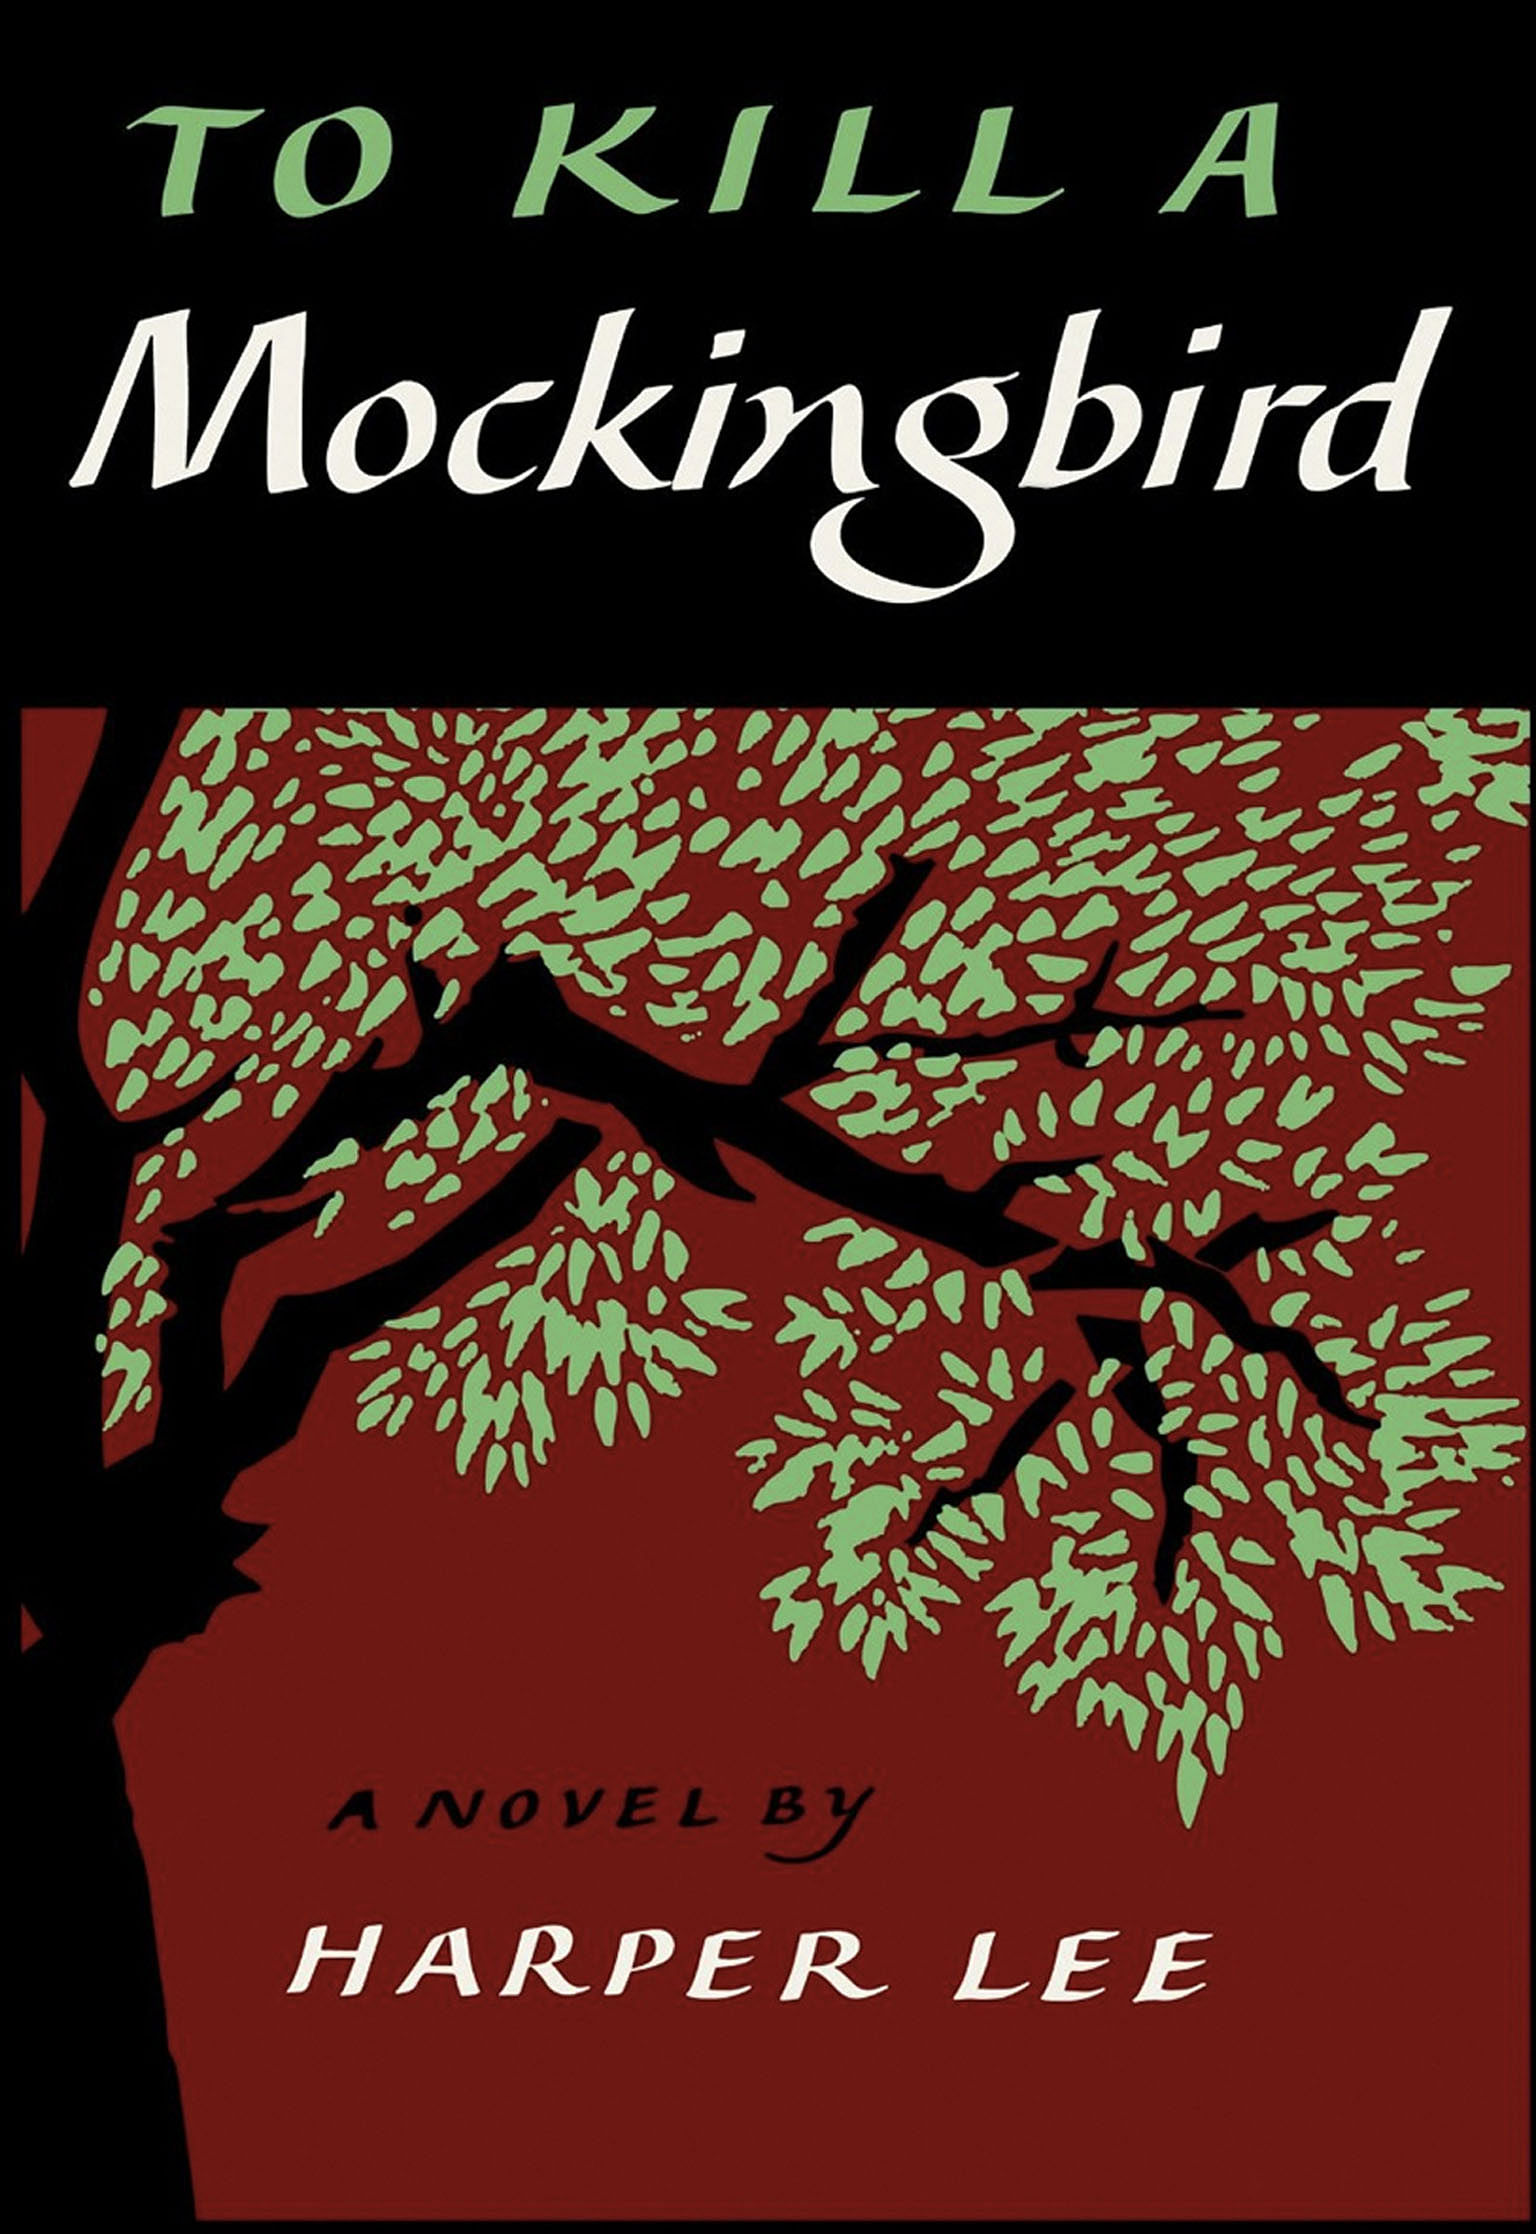 injustice in to kill a mockingbird essay